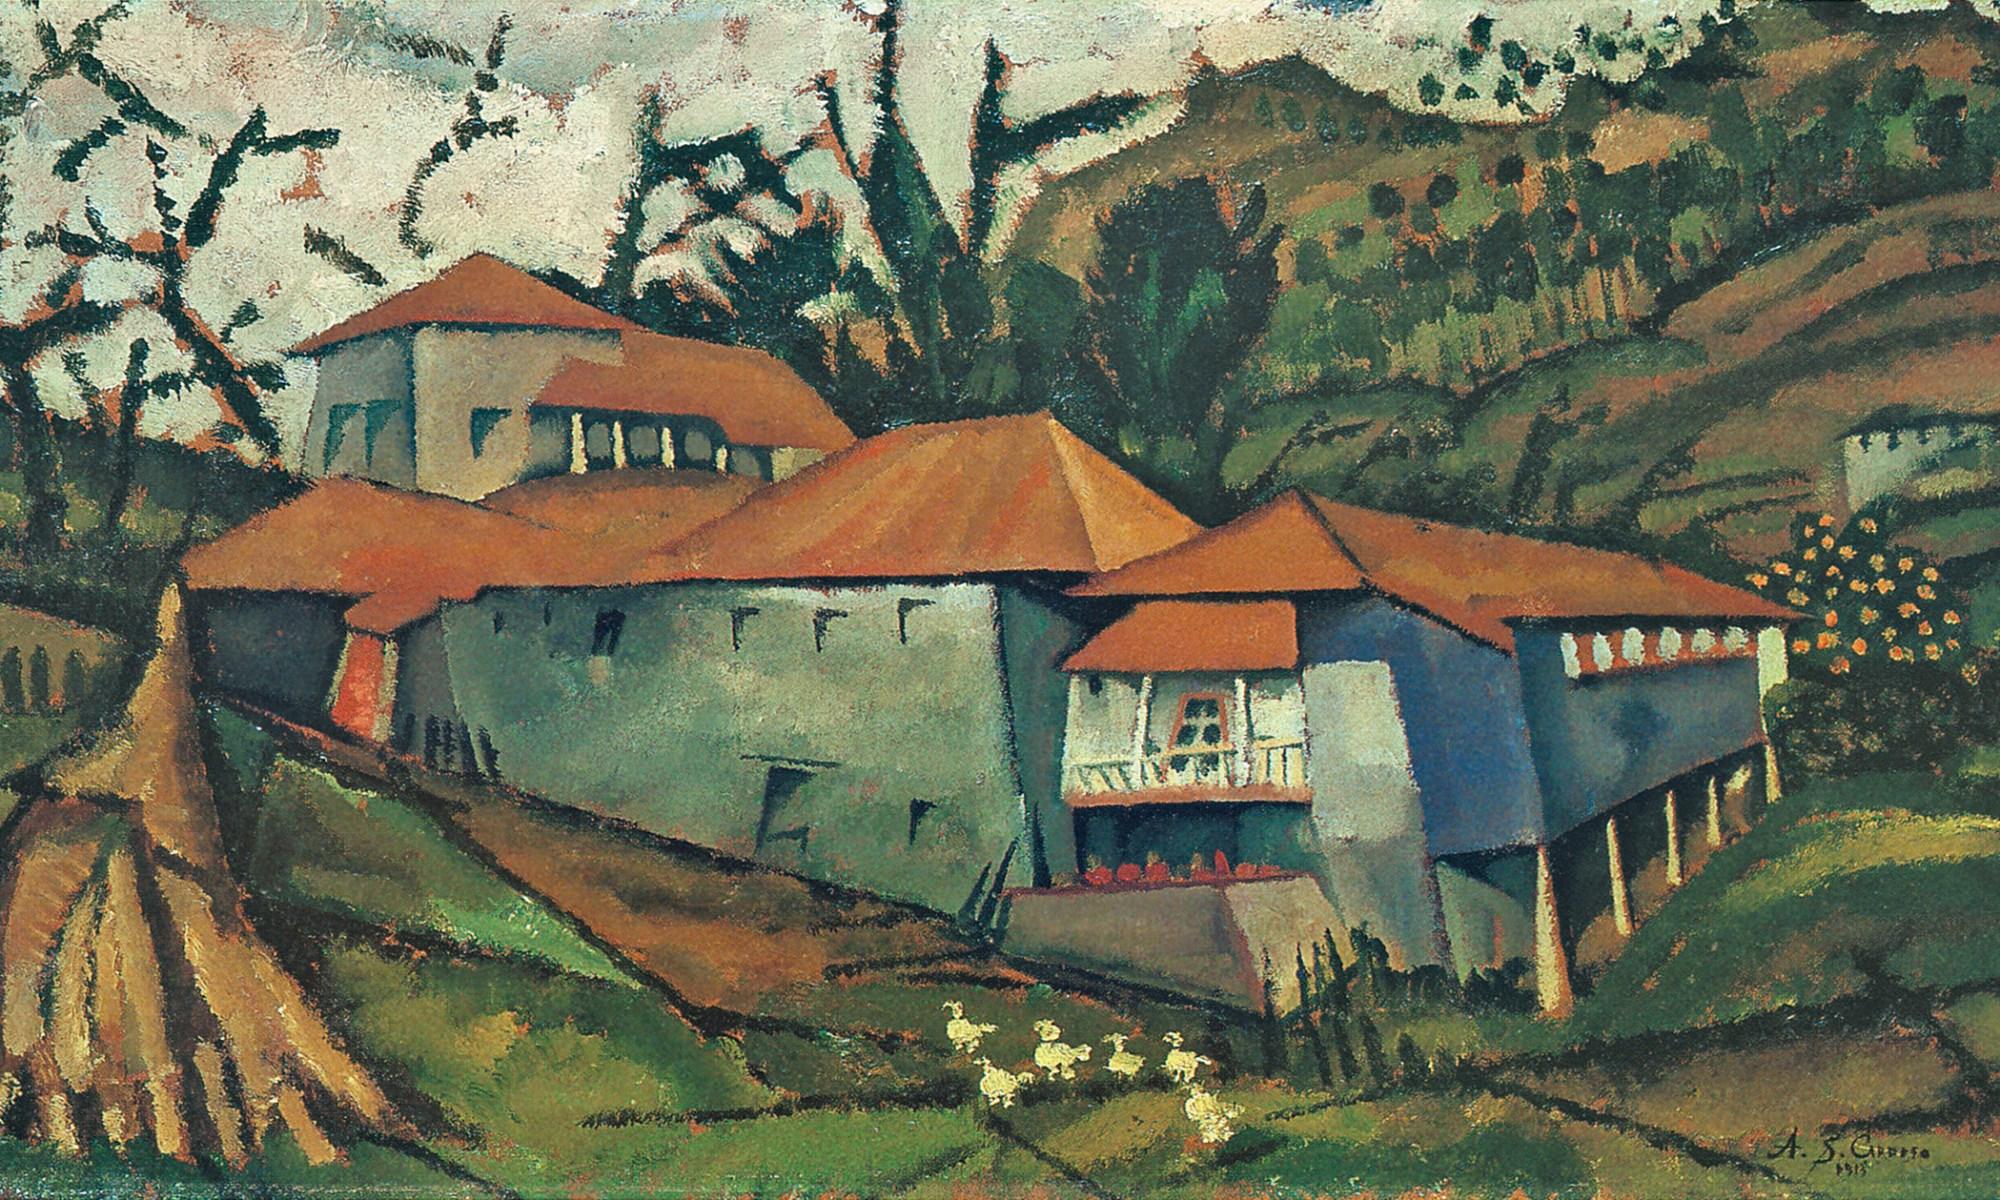 Casa do Ribeiro, 1913. Huile sur bois, 29,5 x 51,7 cm. Collection privée, Porto.